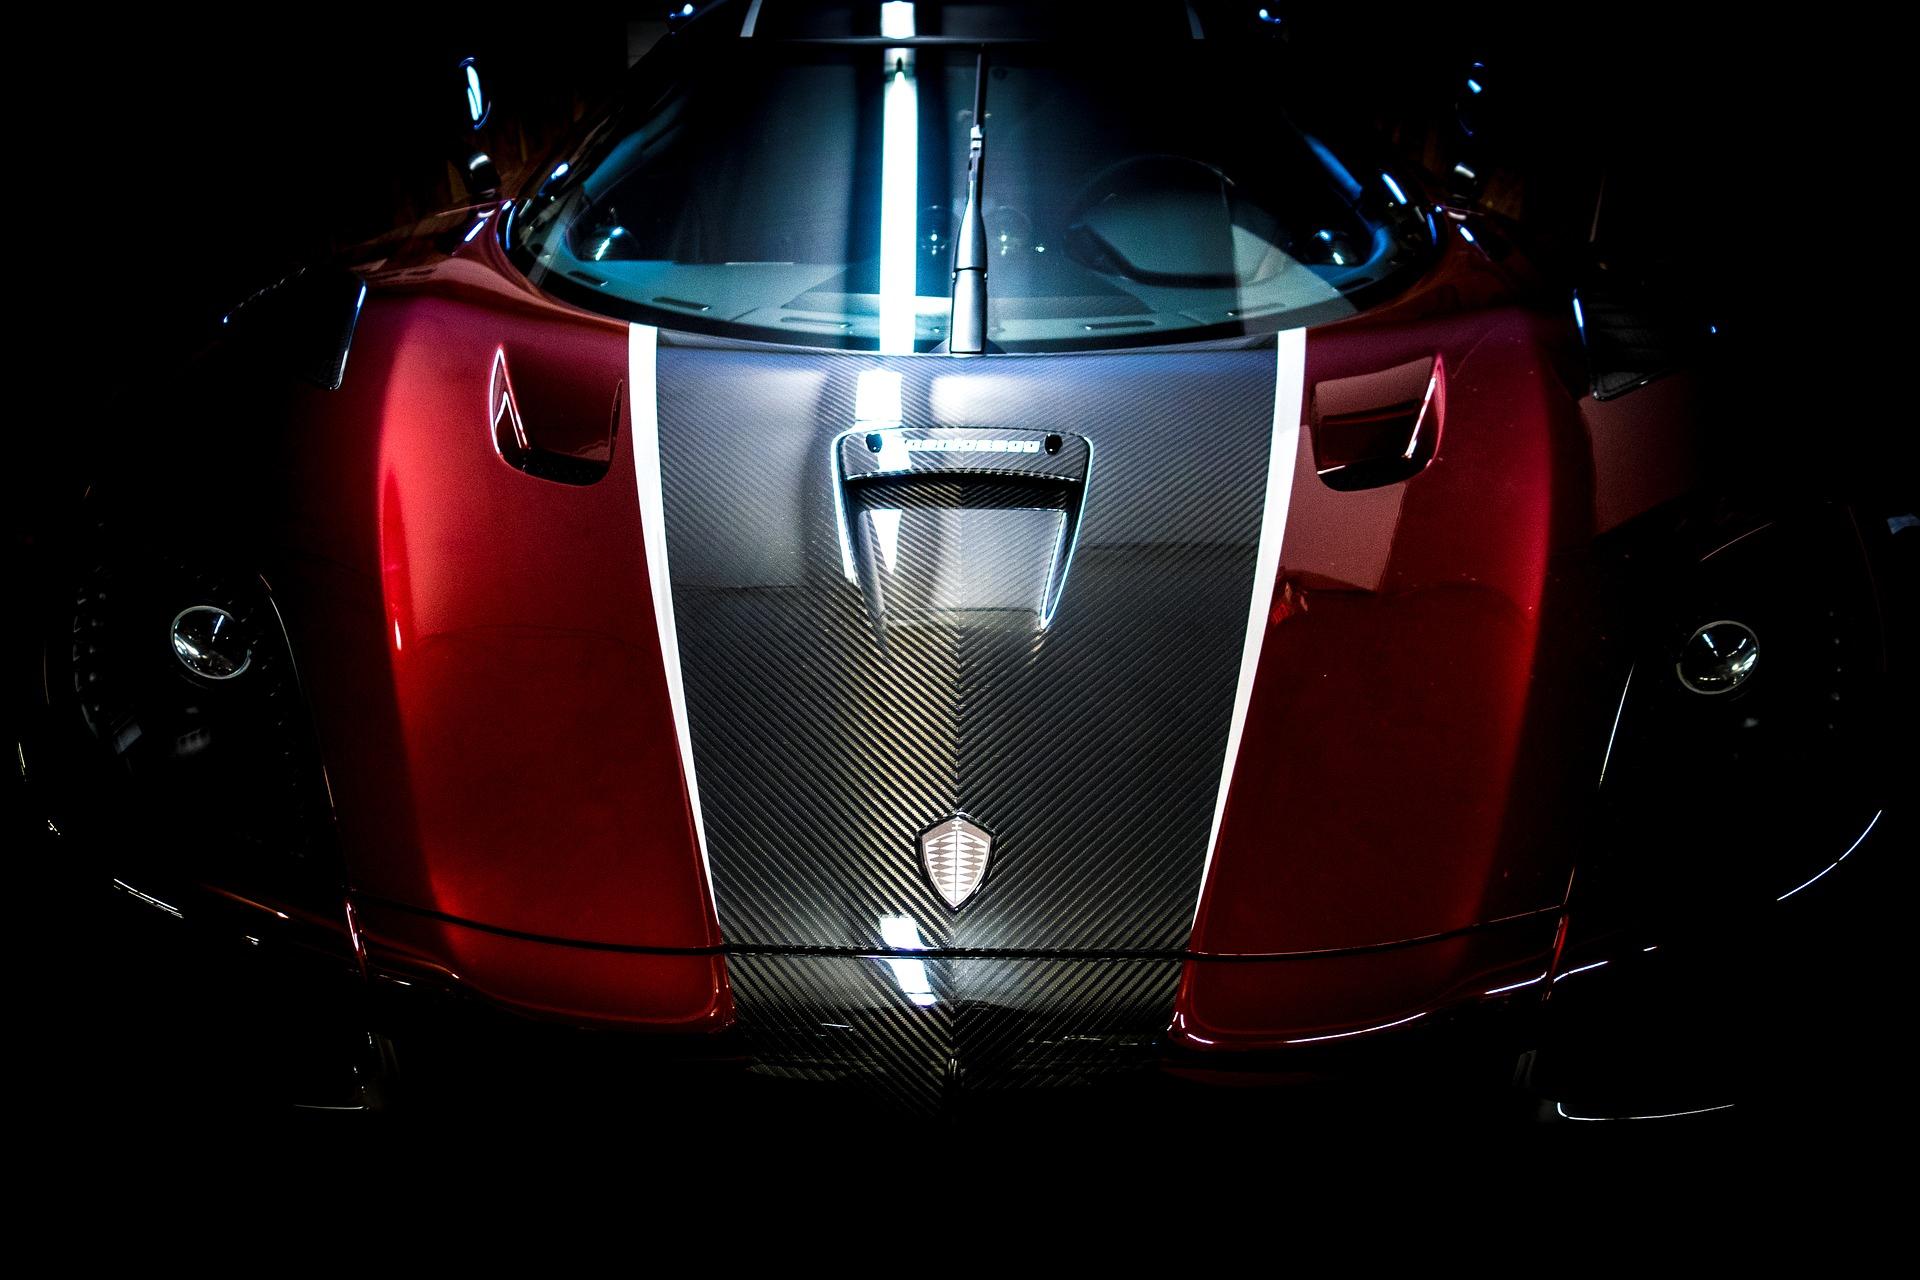 Vehicle Car Speed Auto Transport Automobile